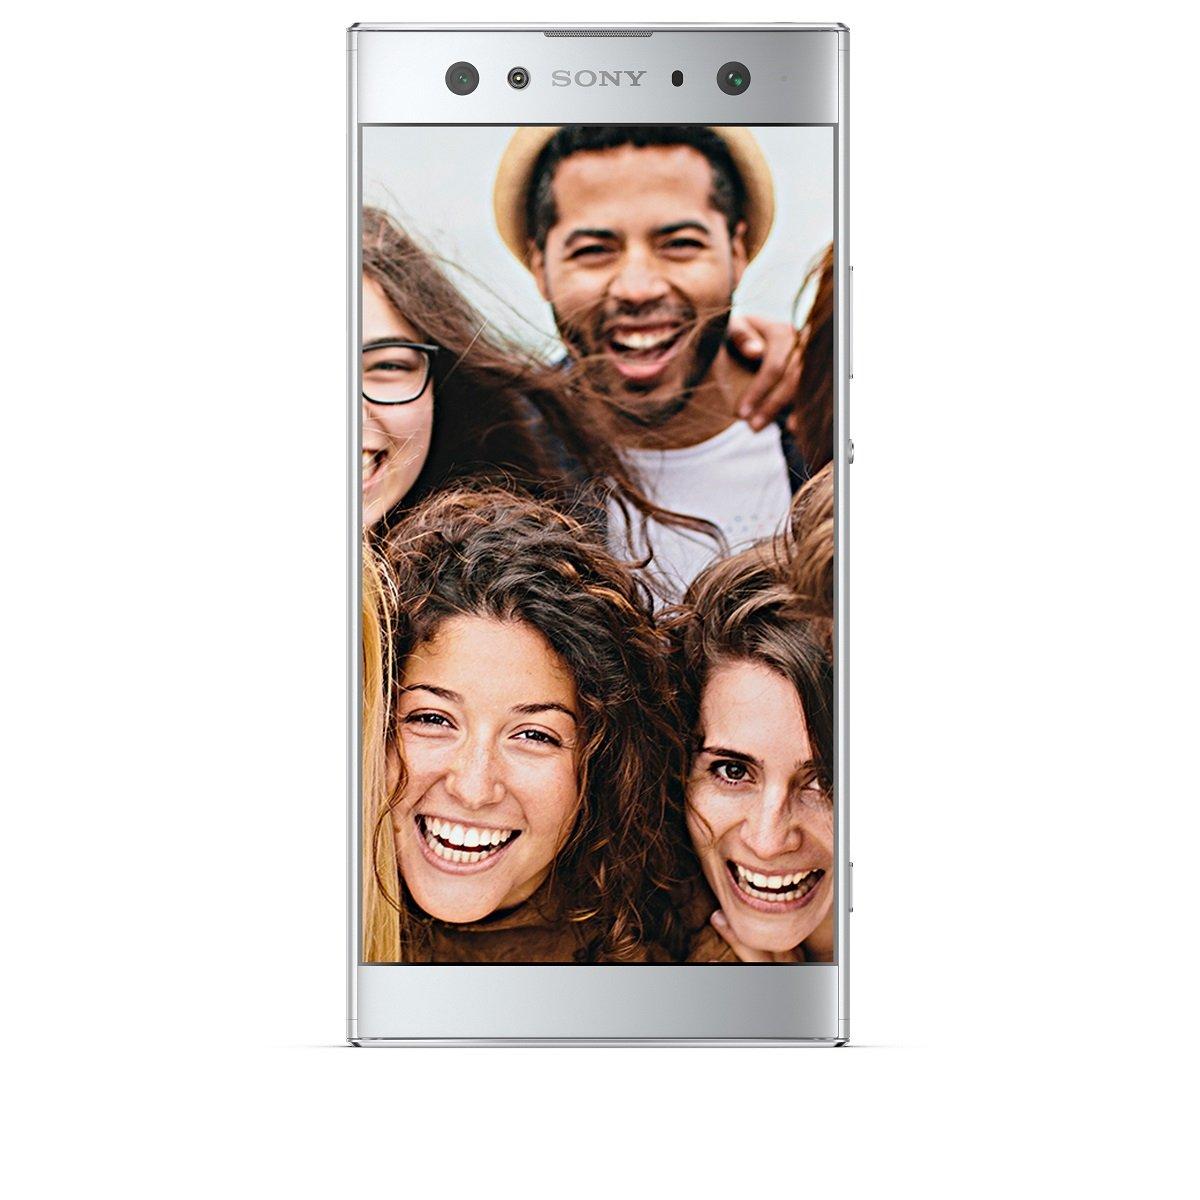 "Sony Xperia XA2 Ultra - Smartphone de 6"" FHD (Snapdragon 630, Octa Core 2.2 GHz, 4 GB de RAM, Memoria Interna de 32 GB, cámara de 23 MP, Android), Color Plata [Versión española]"